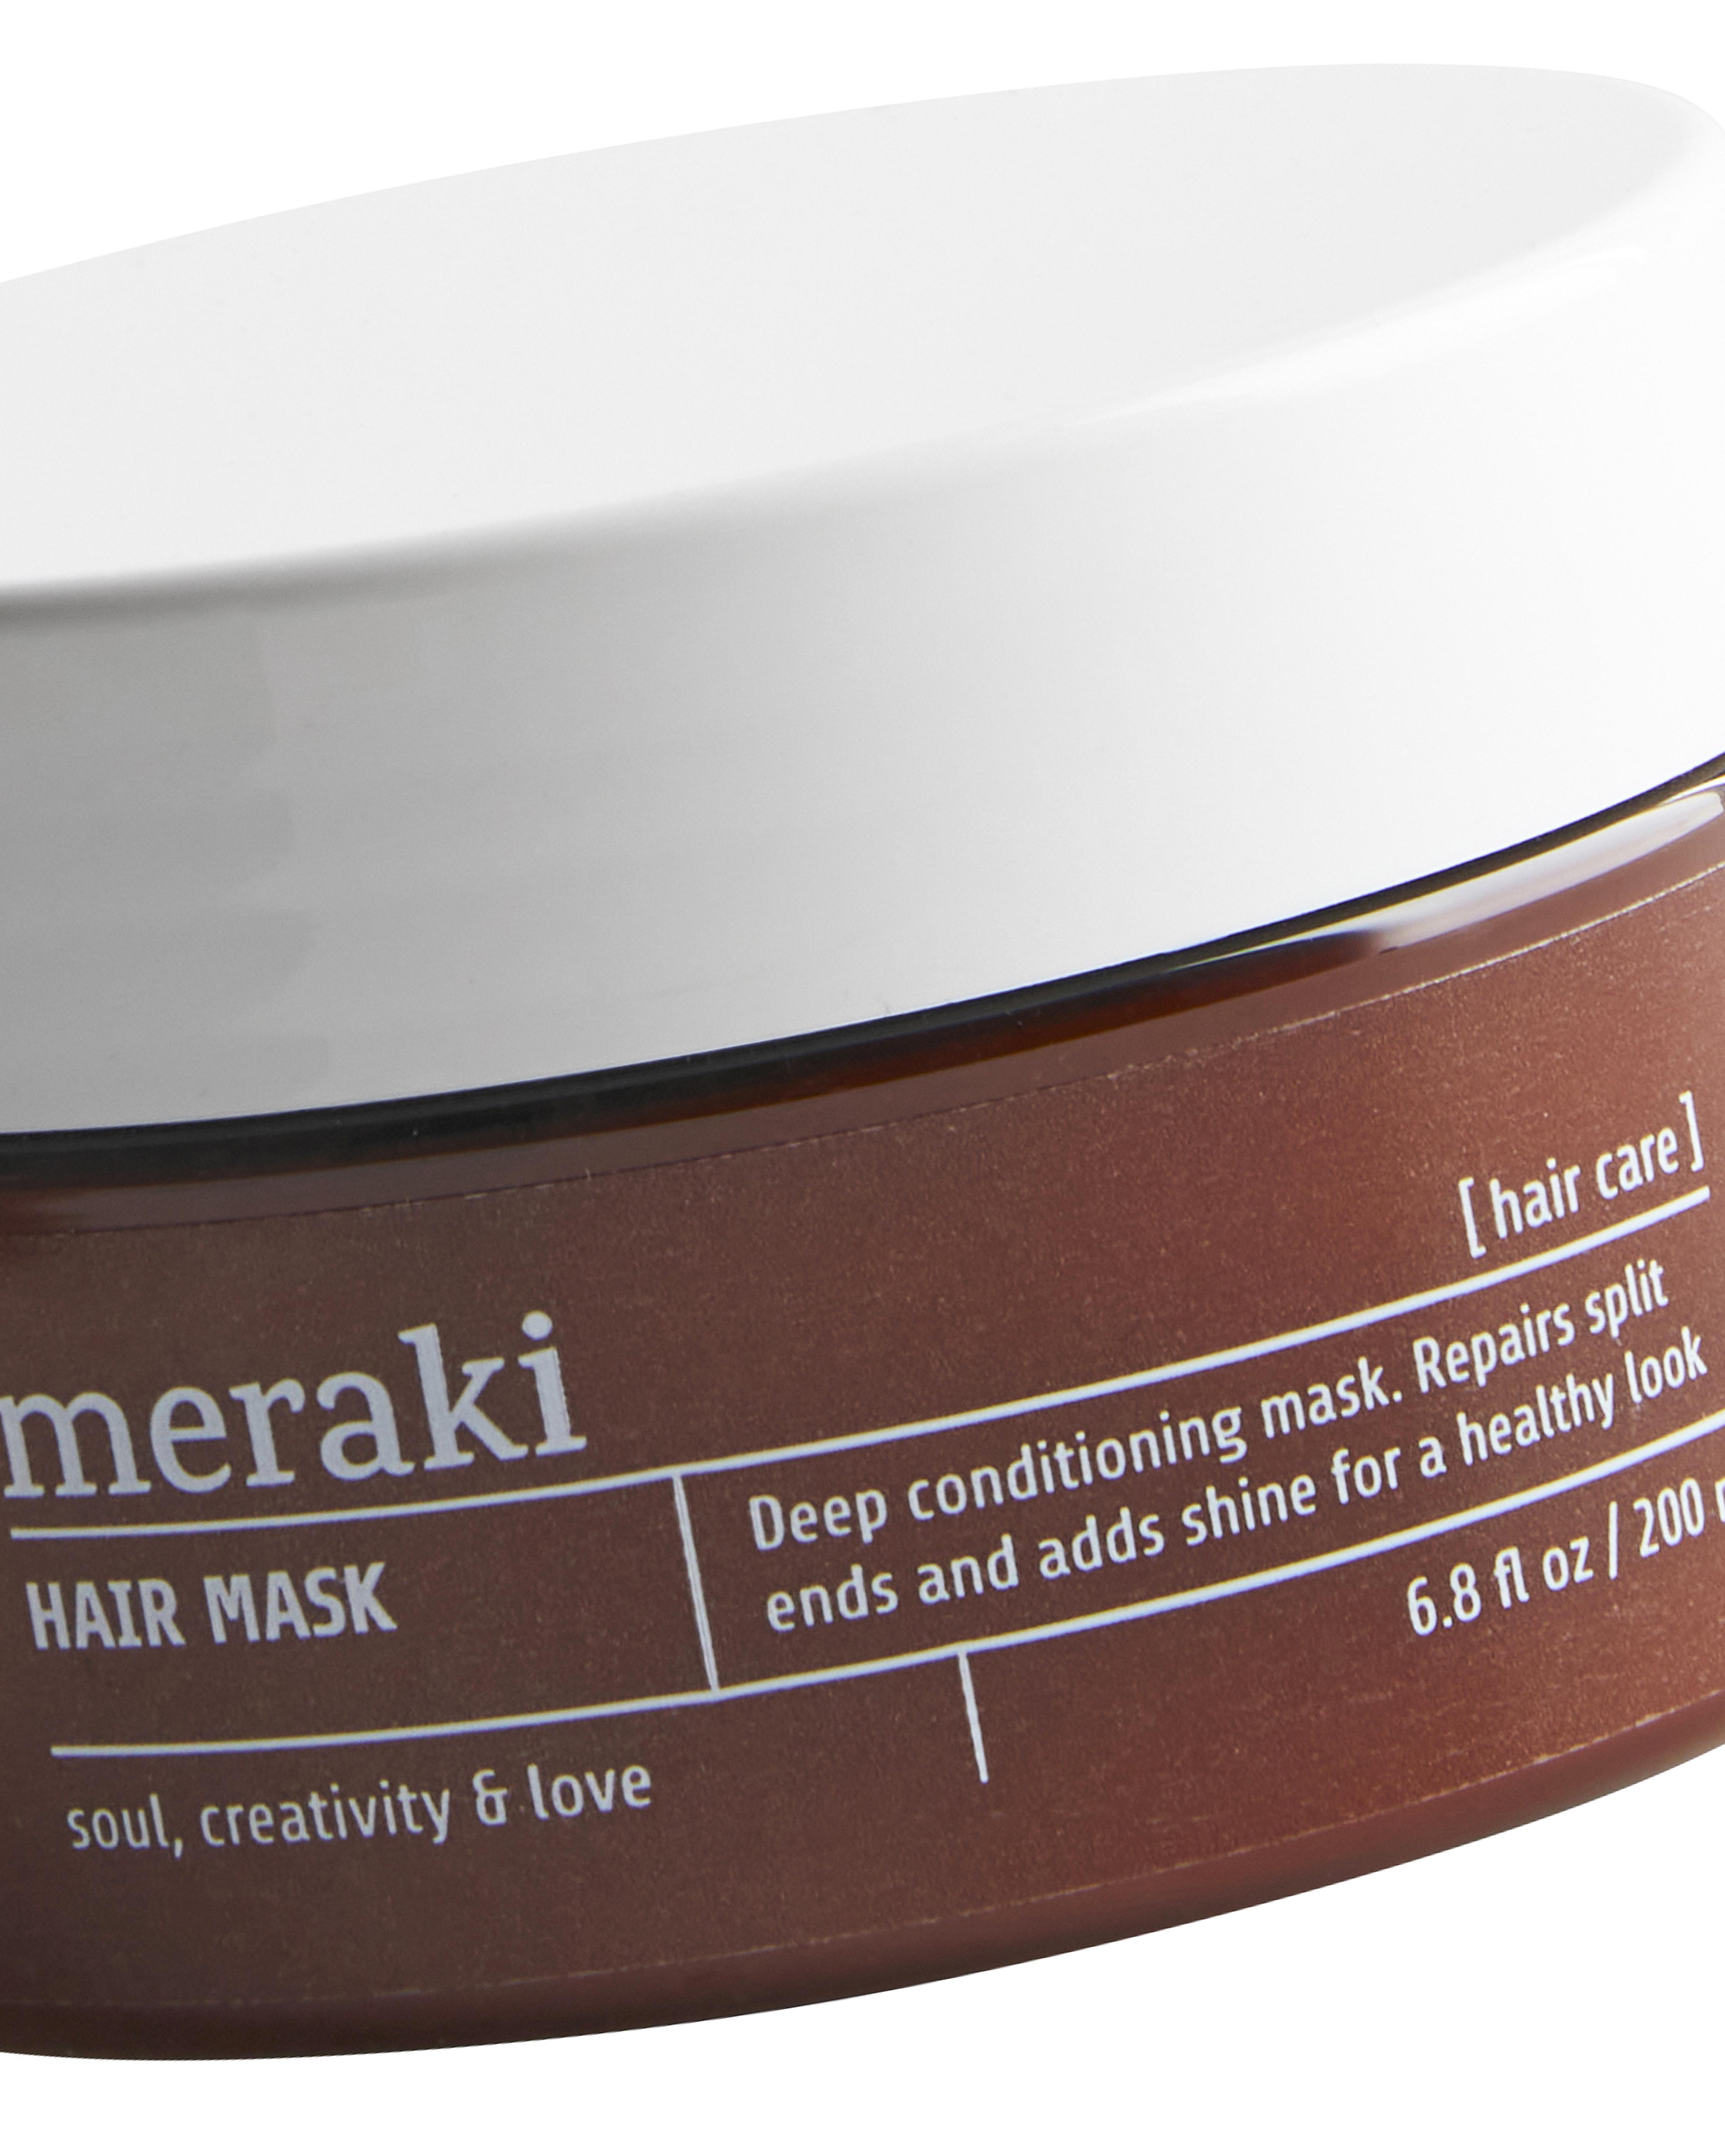 Meraki Hair Mask, 200 ml